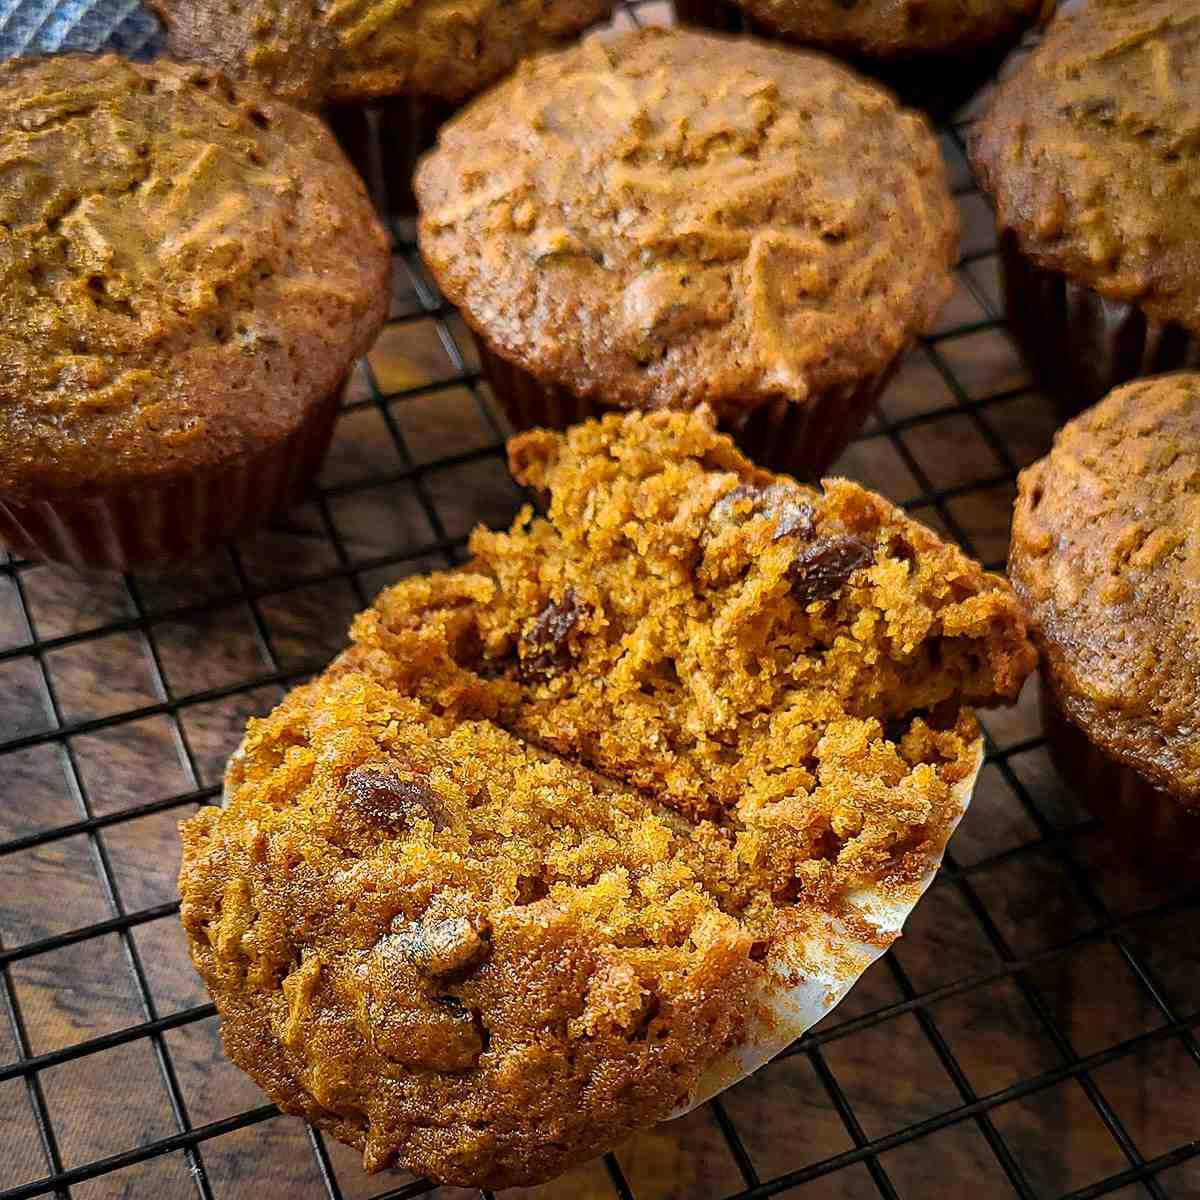 a close-up photo of a split open molasses bran muffin